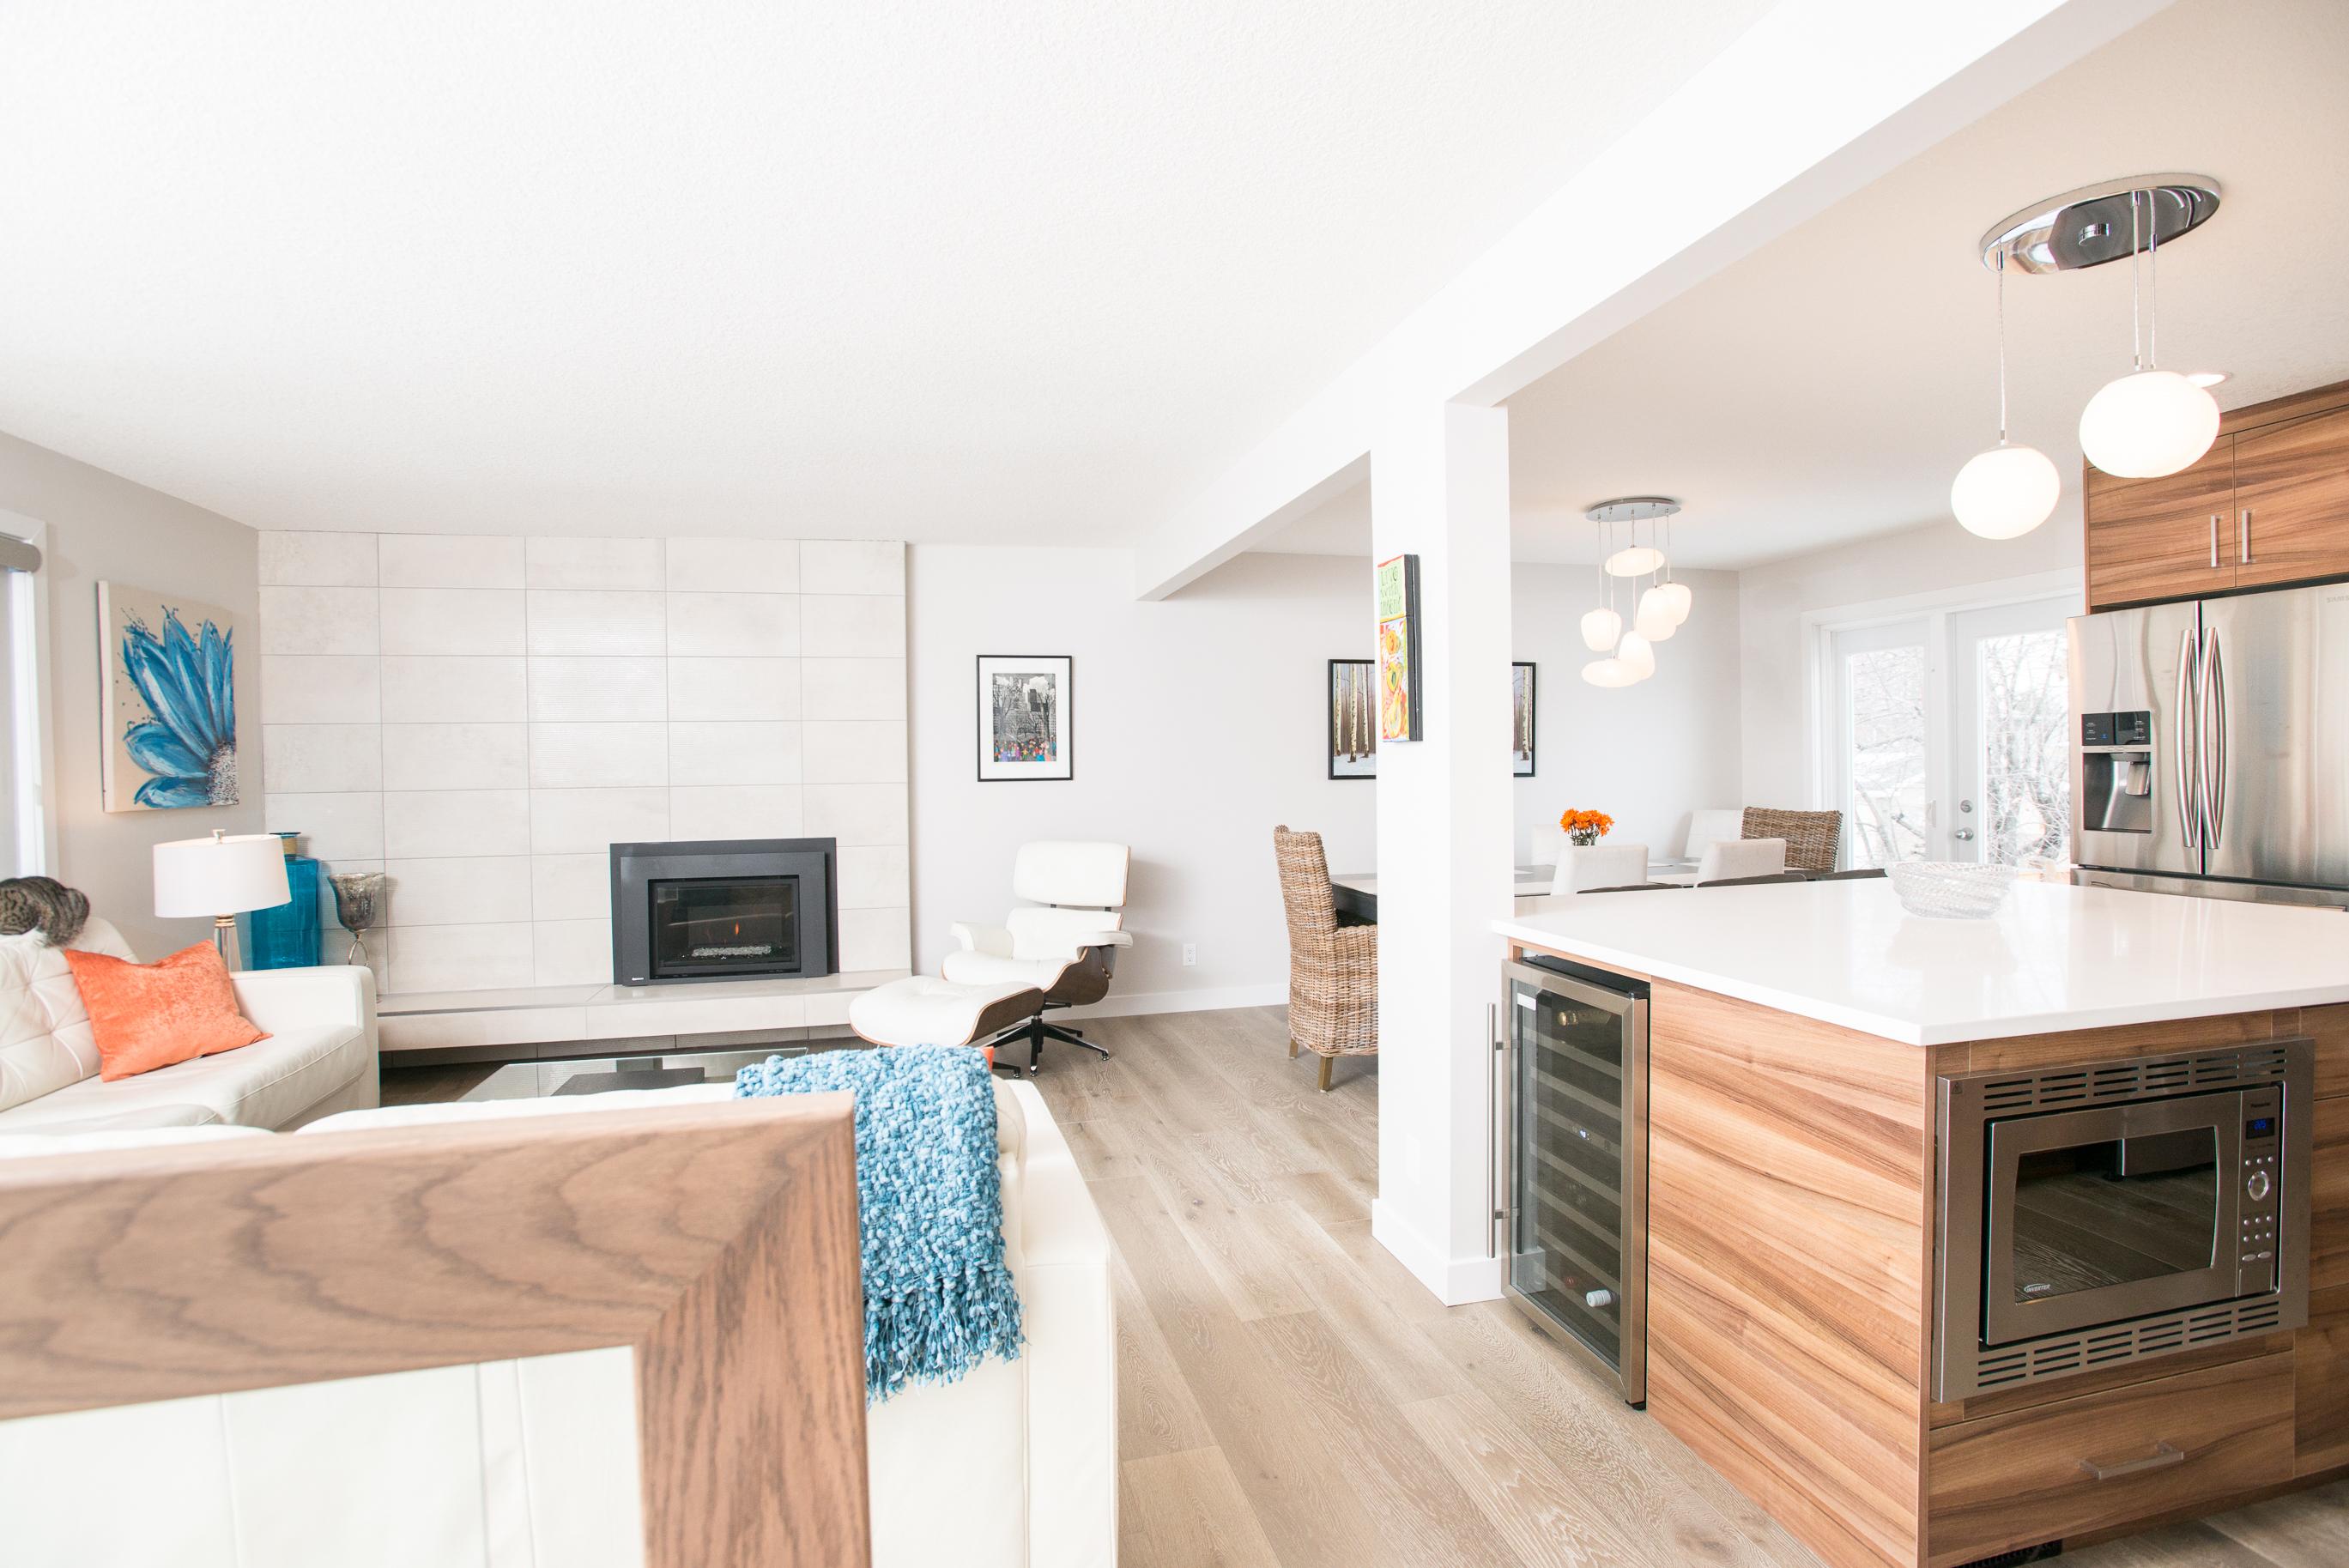 Edmonton Residential Contractor